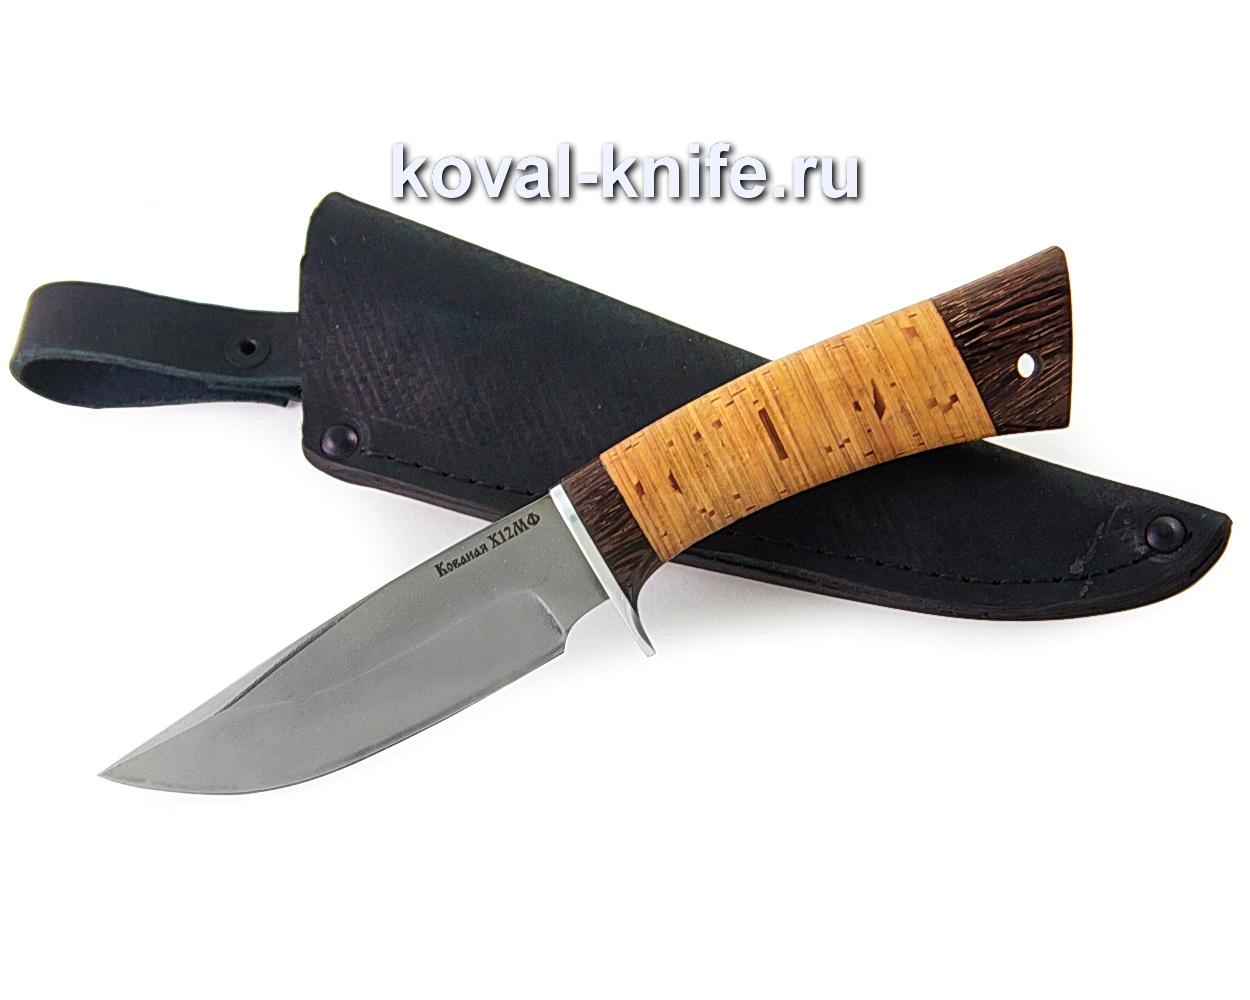 Нож Норвег из стали х12мф (рукоять береста) A357